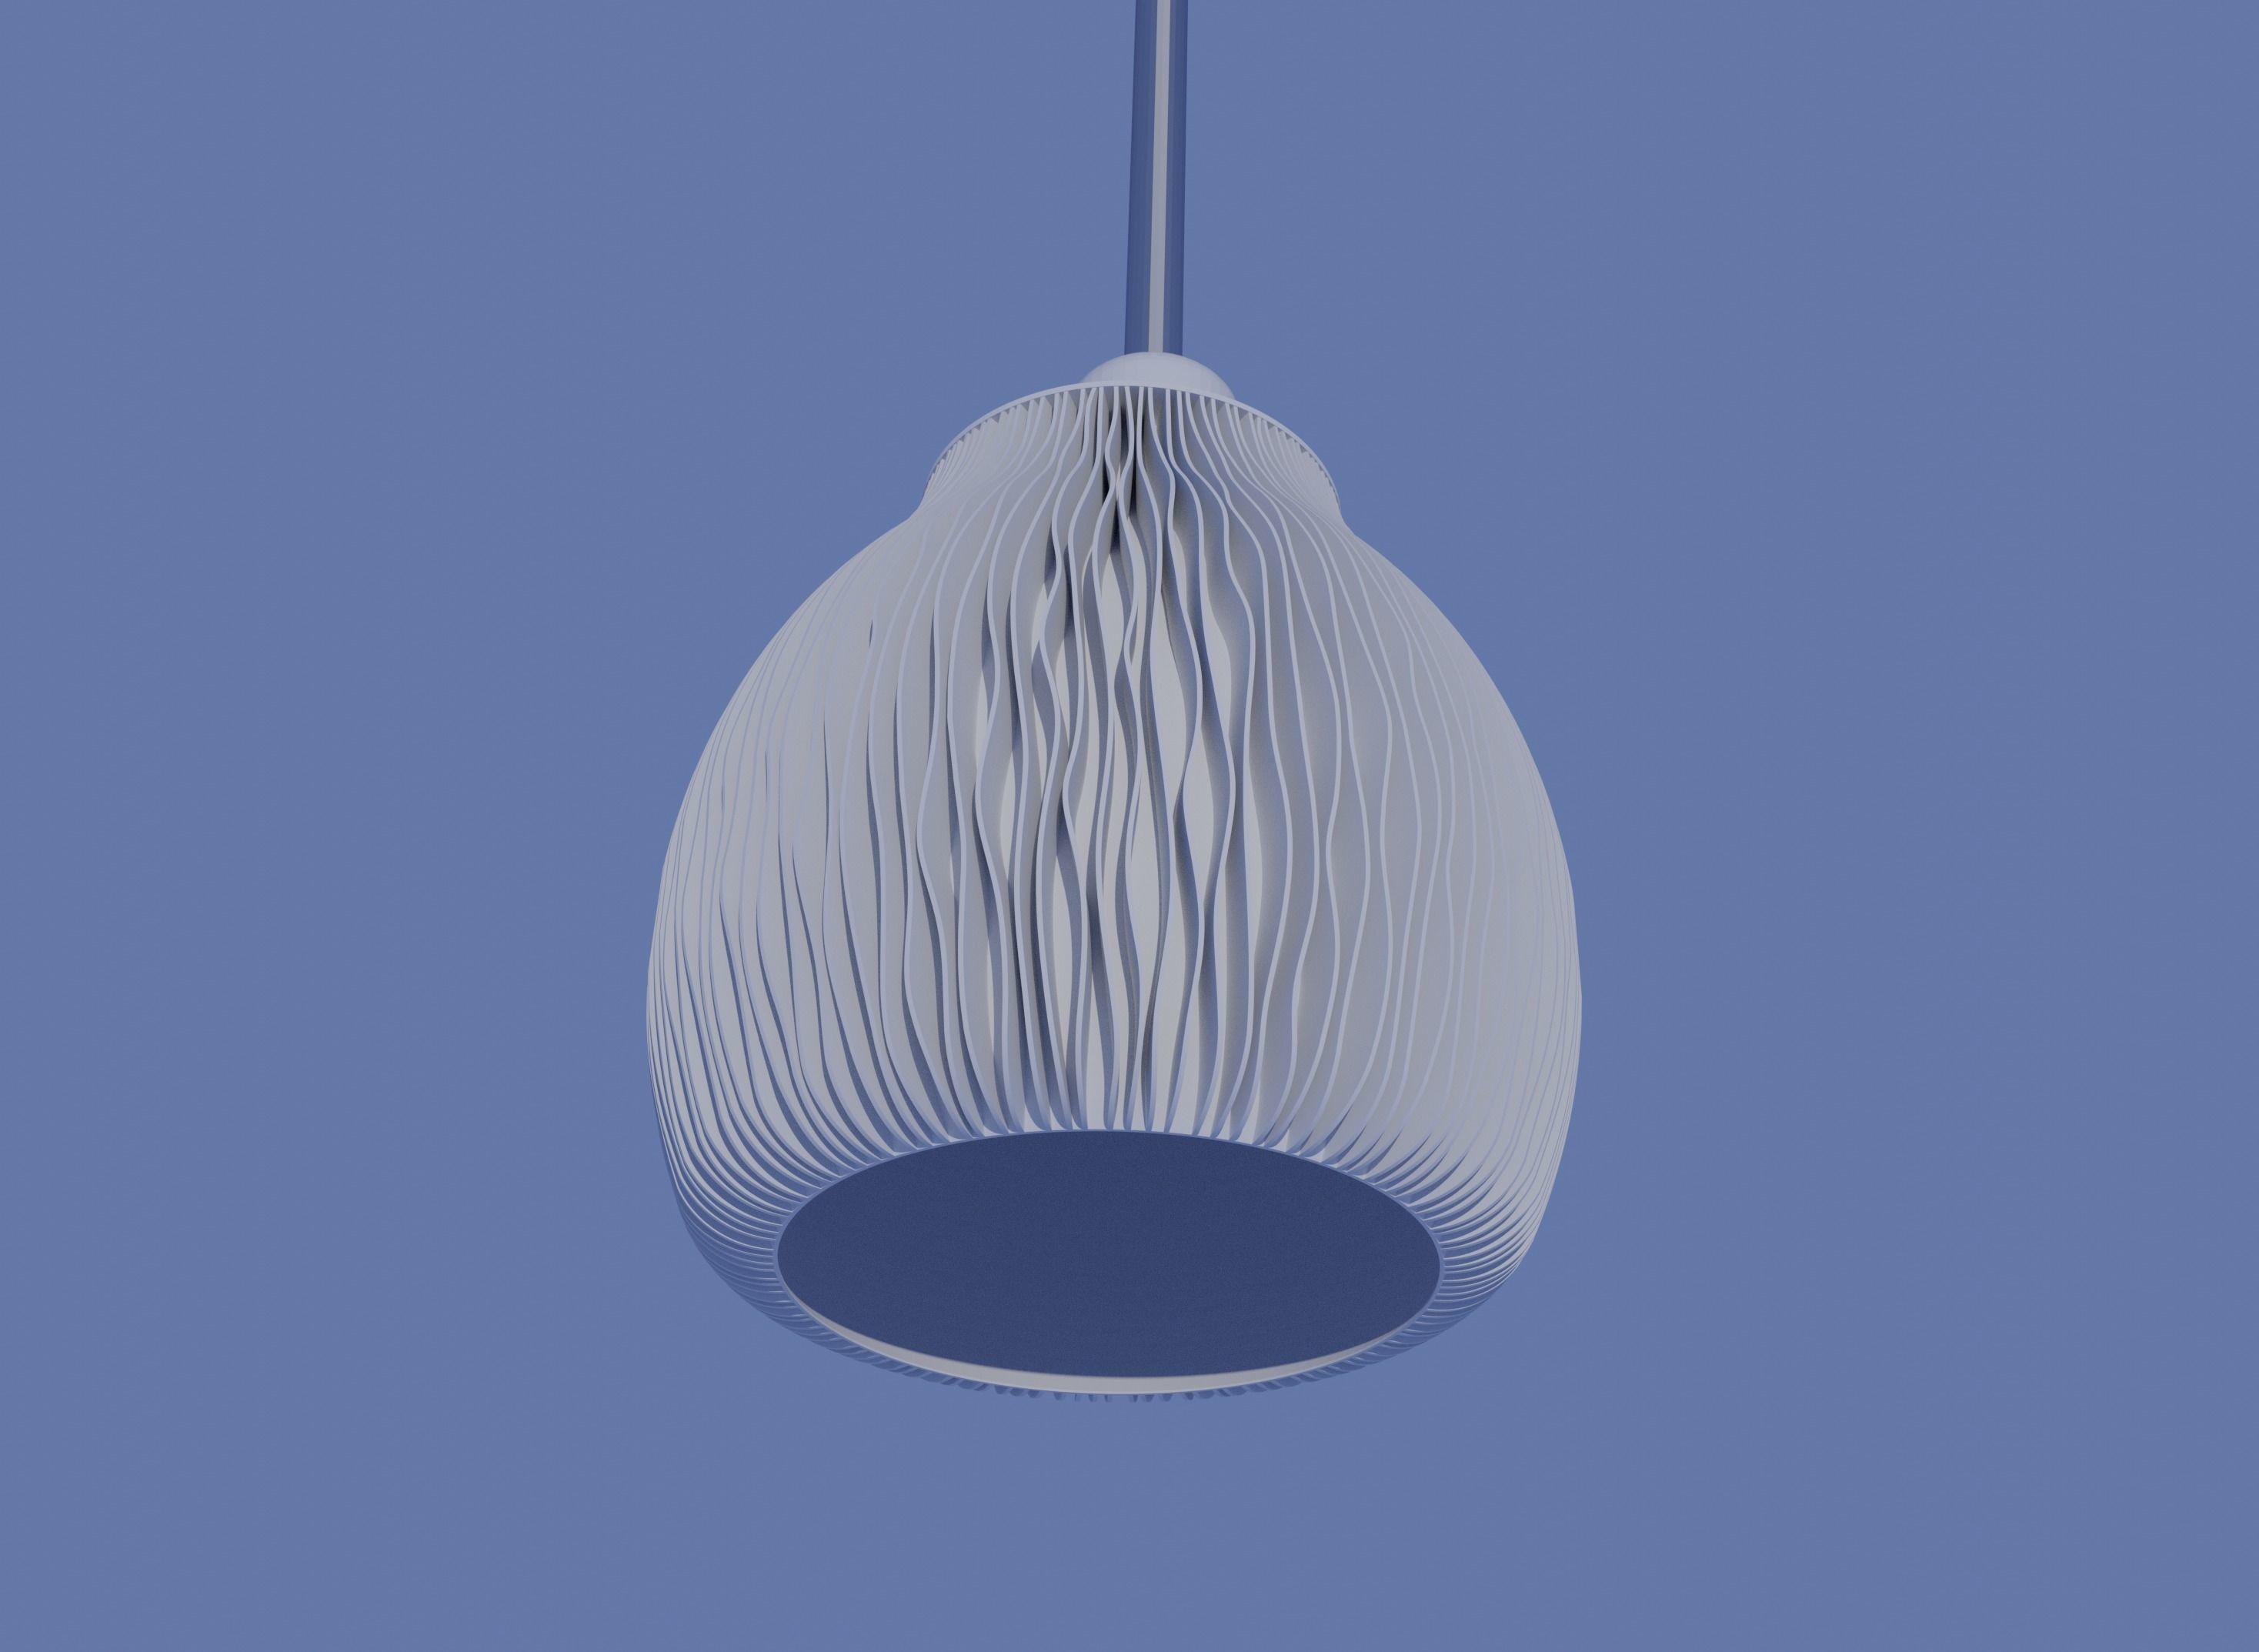 Lampshade - NATURE MUSHROOM - table or pendant lamp - E27 mount